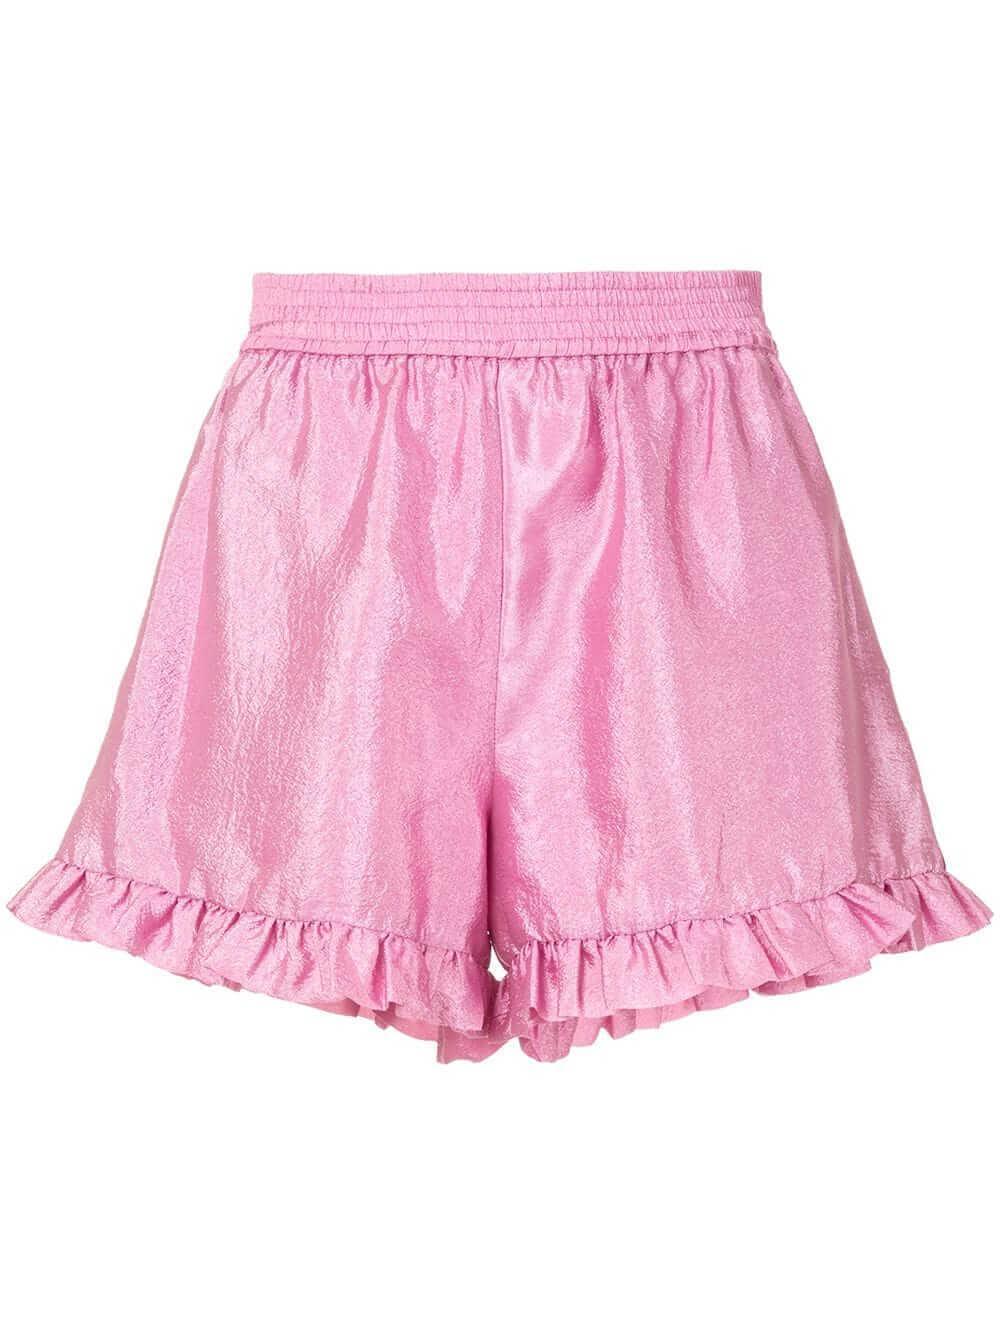 Joselyn Ruffle Bottom Short Item # SG2912